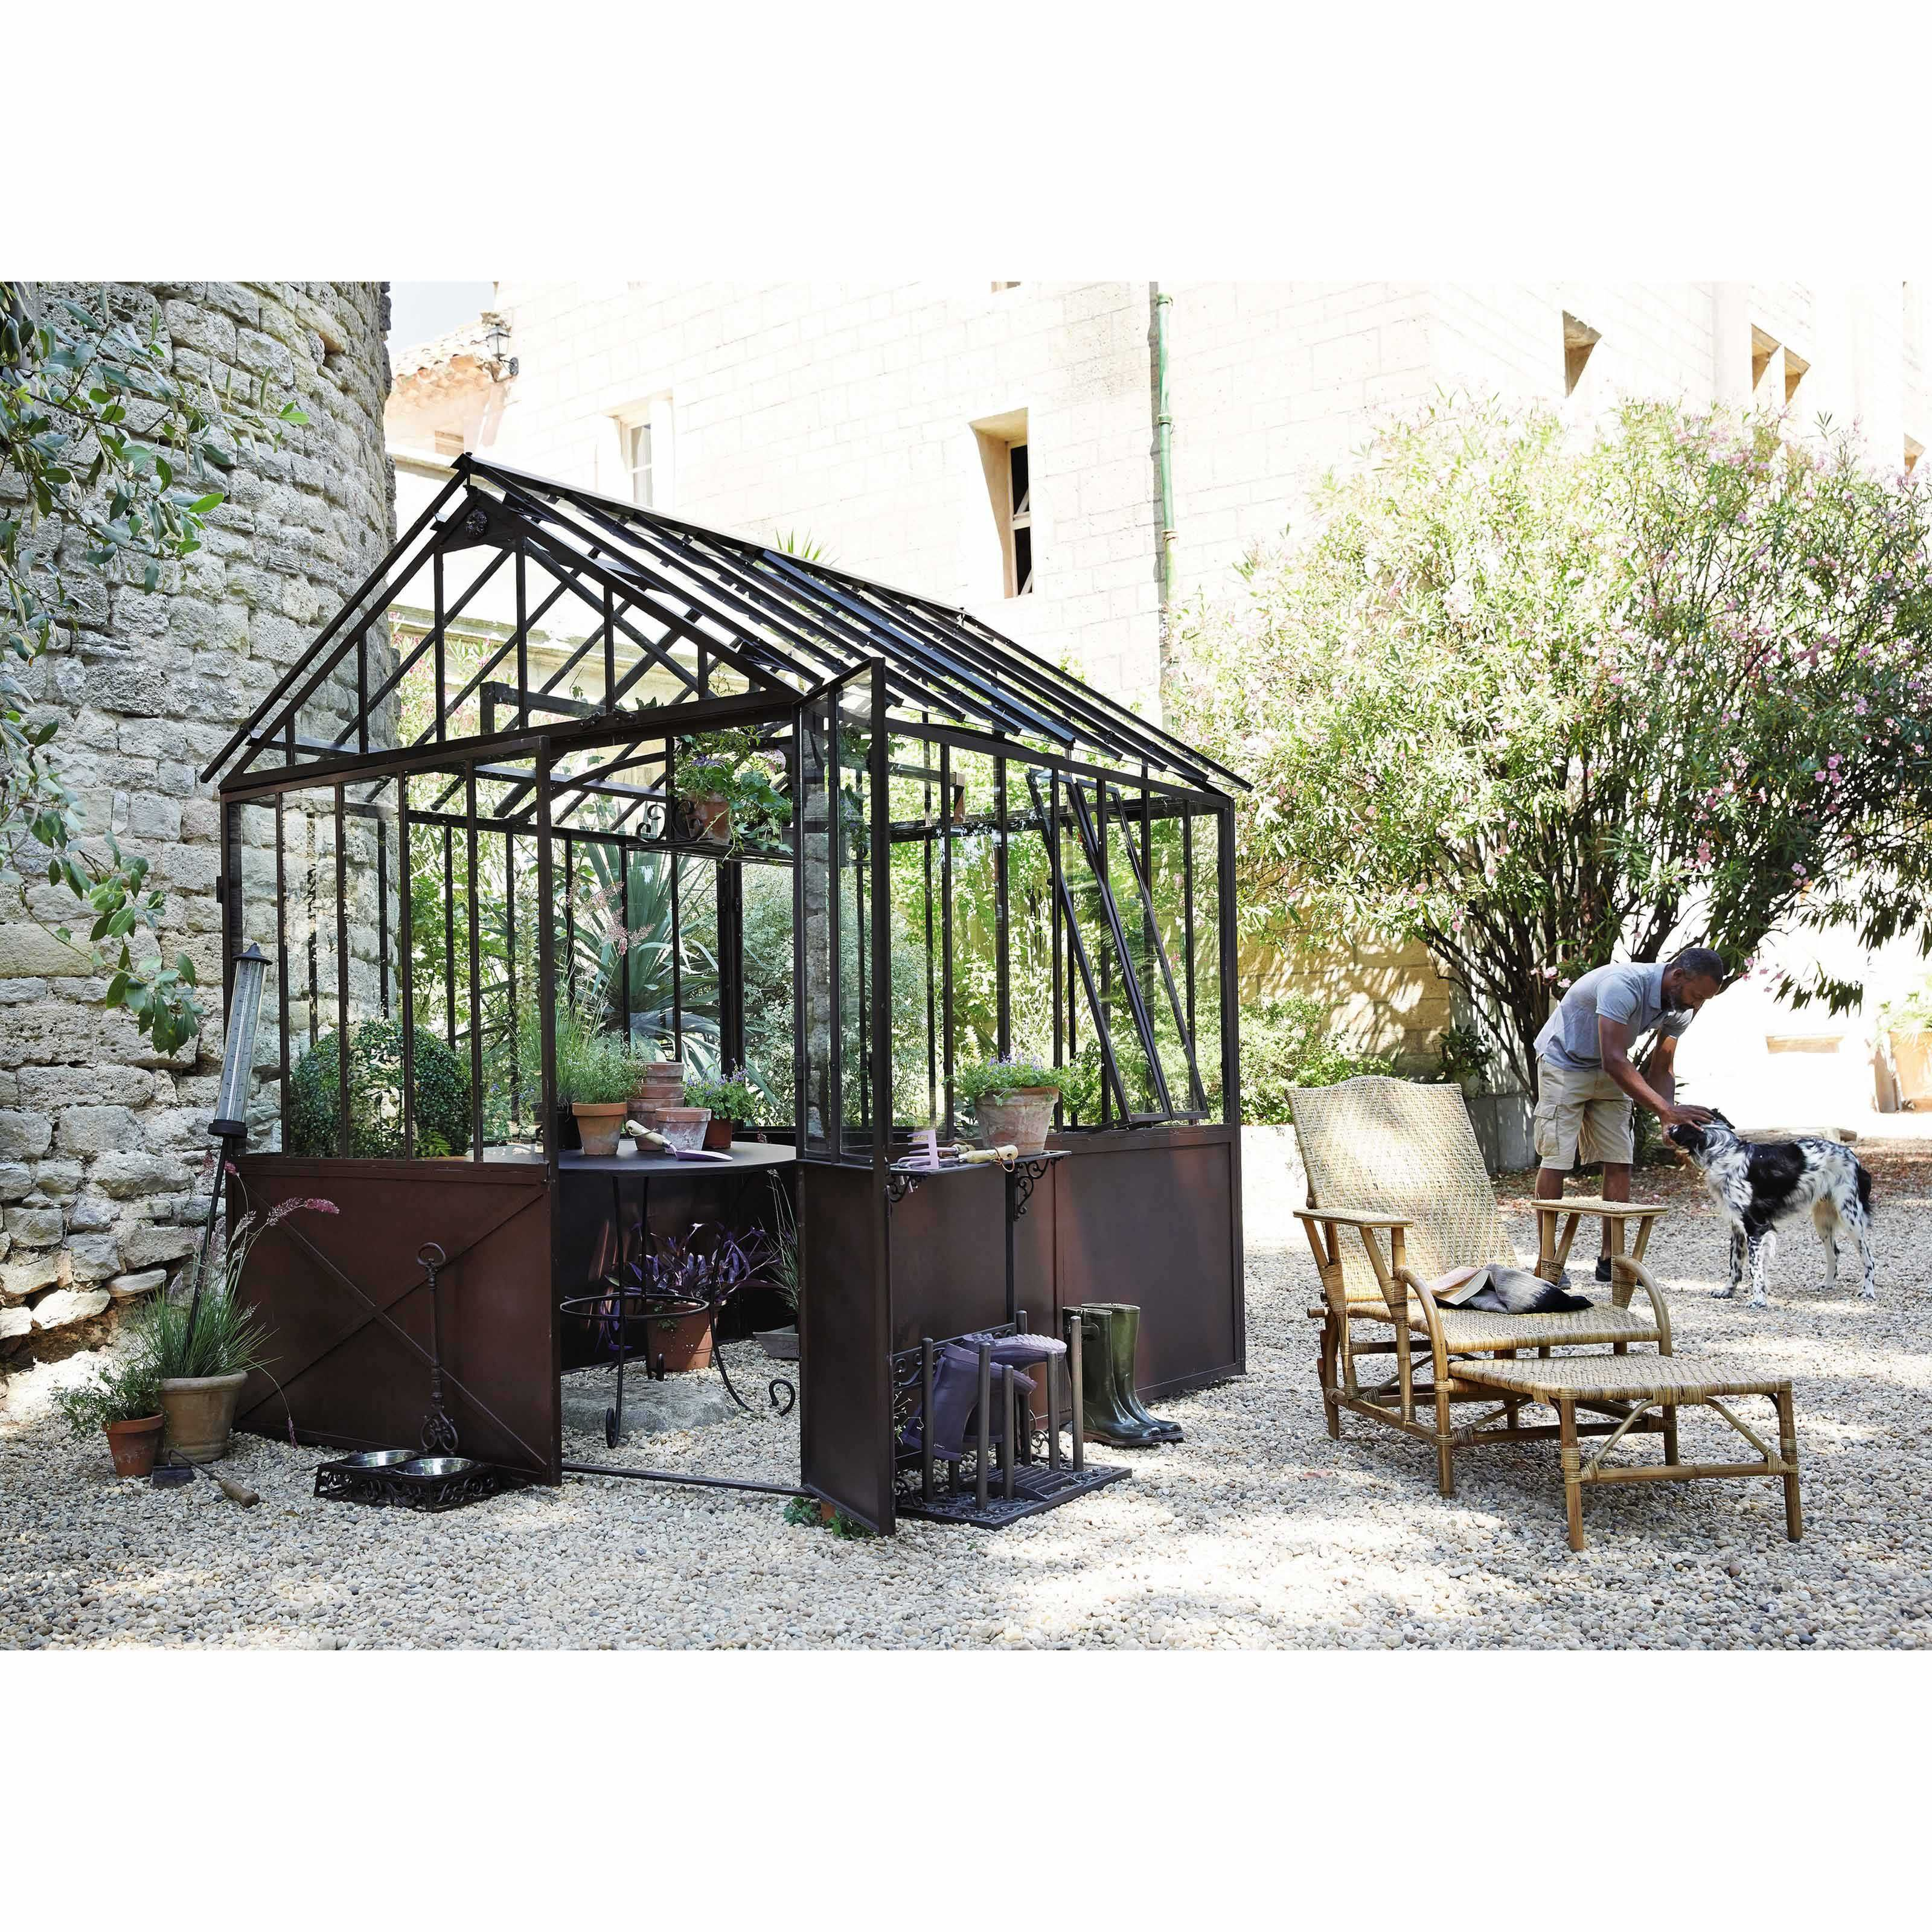 Tavolo Giardino Maison Du Monde.Serra In Metallo Effetto Ruggine H 252 Cm Giardino Mediterraneo